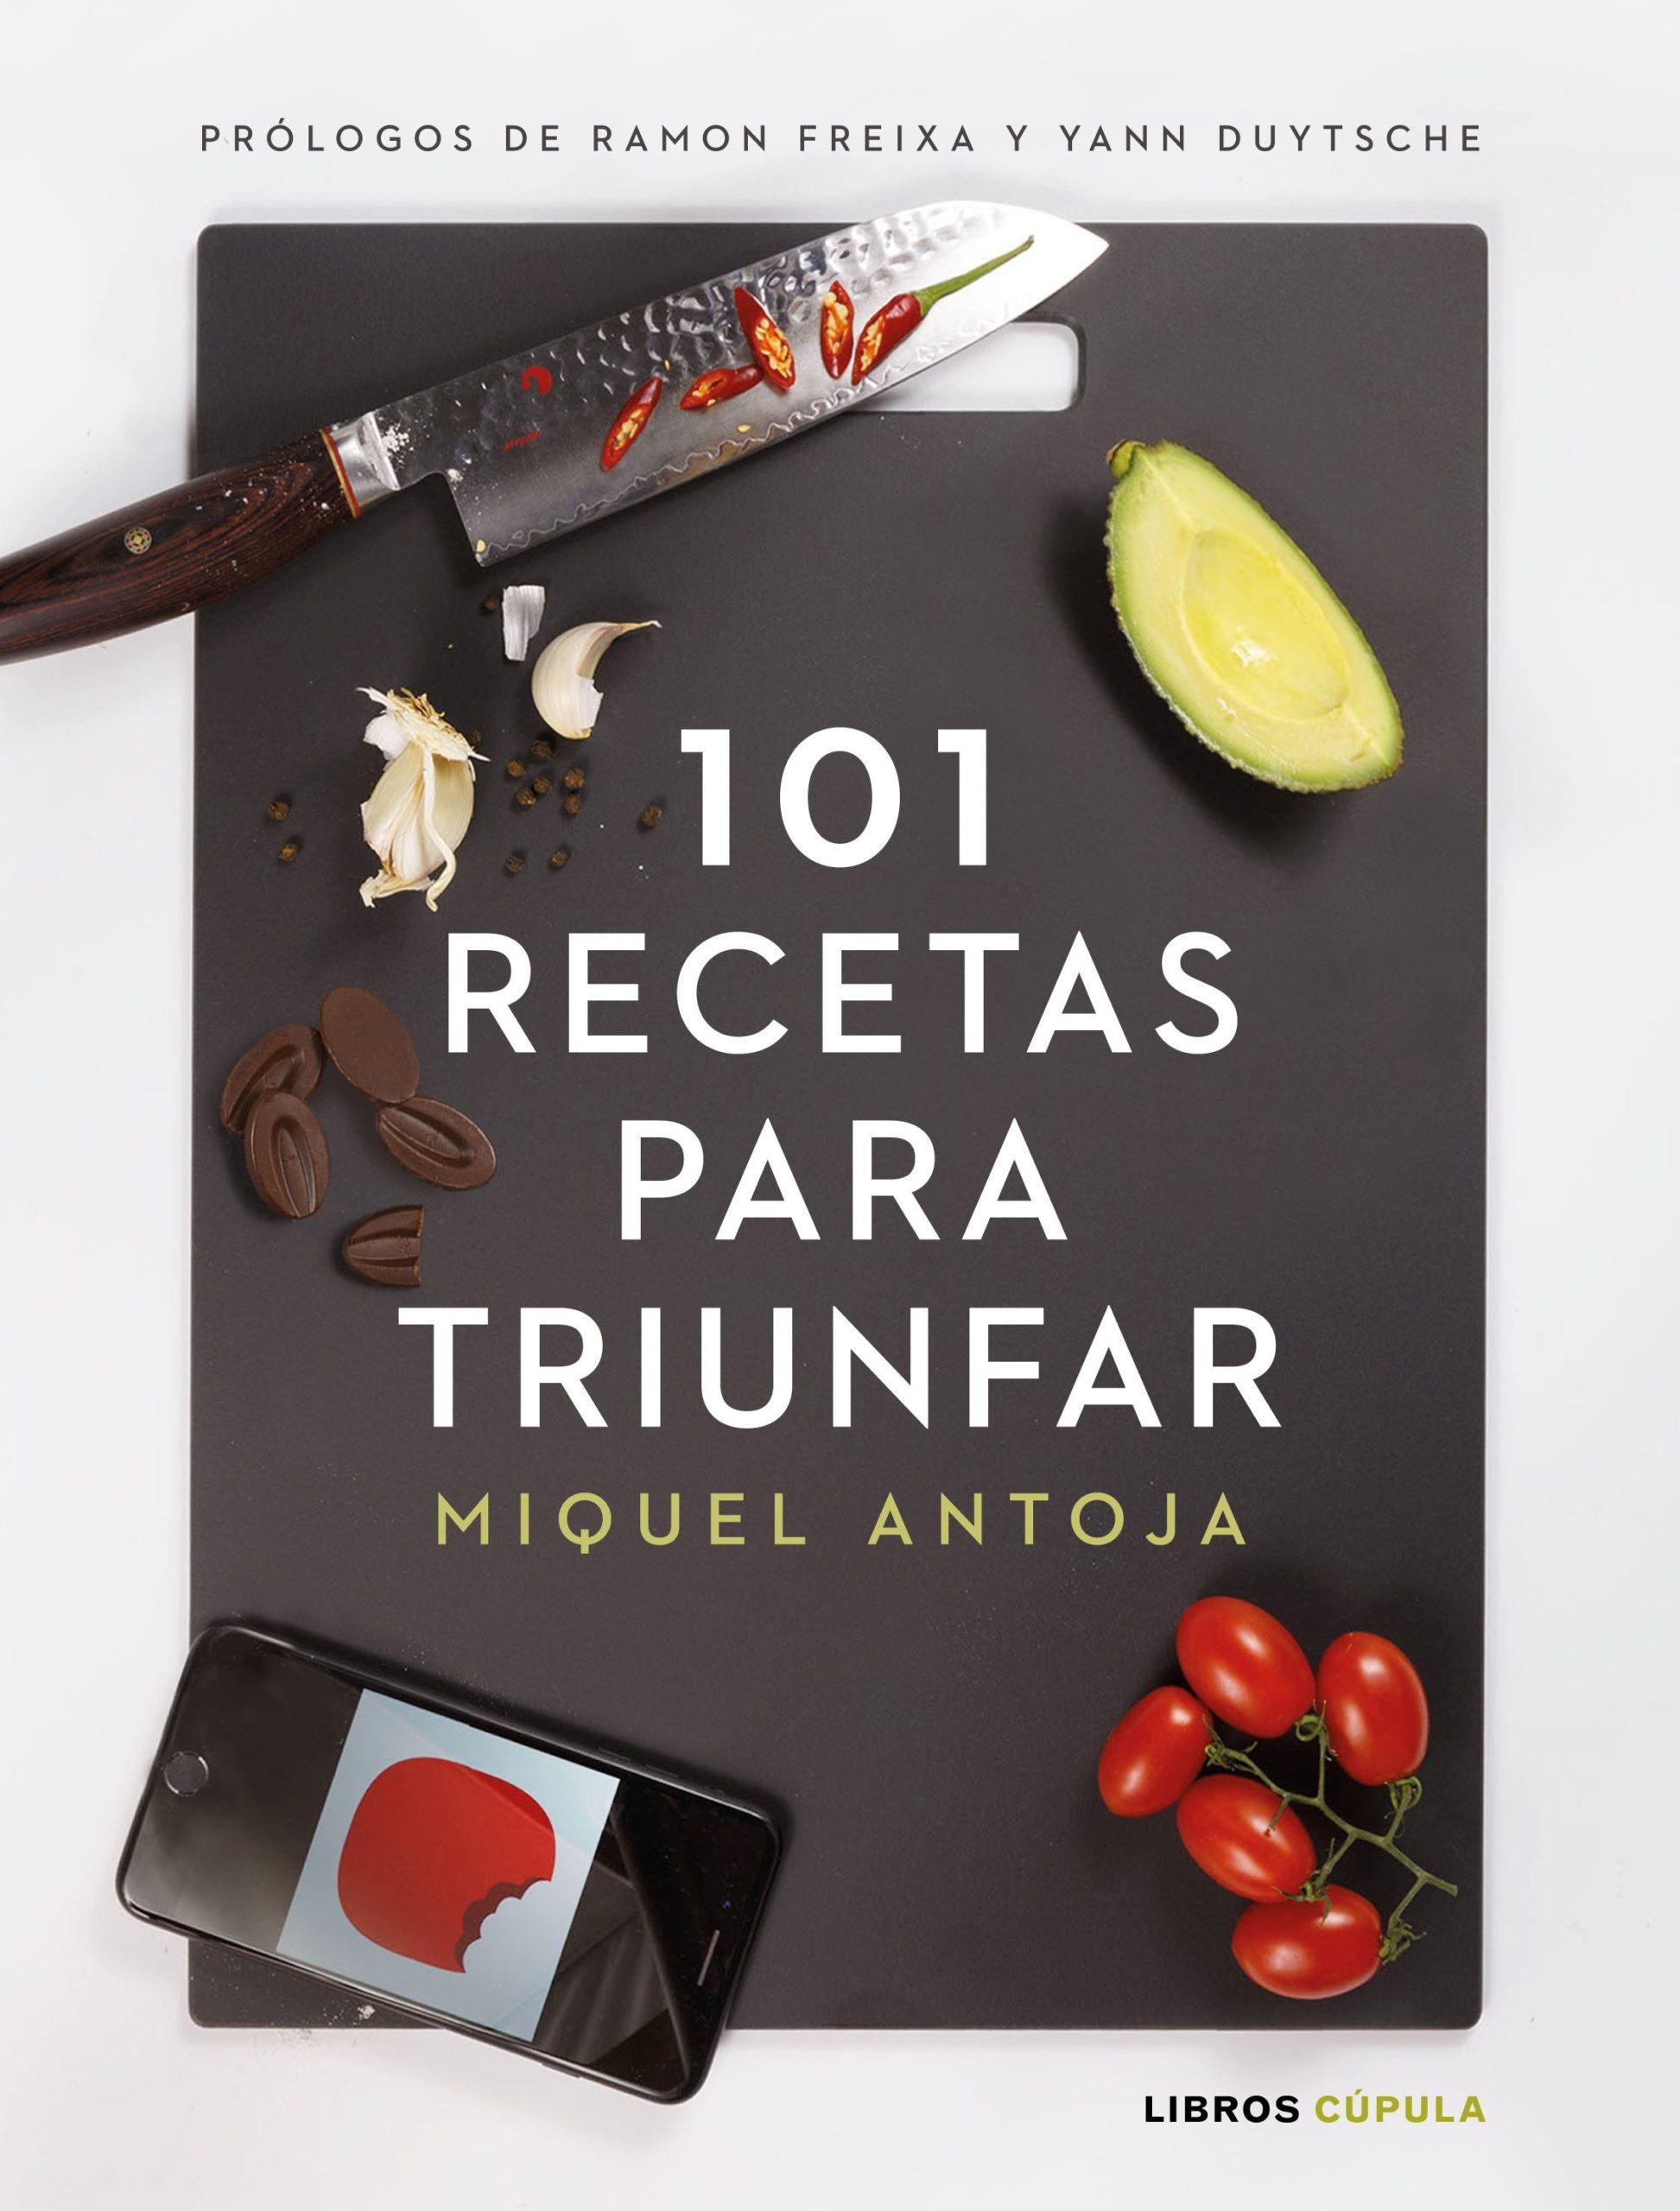 101 recetas para triunfar miquel antoja